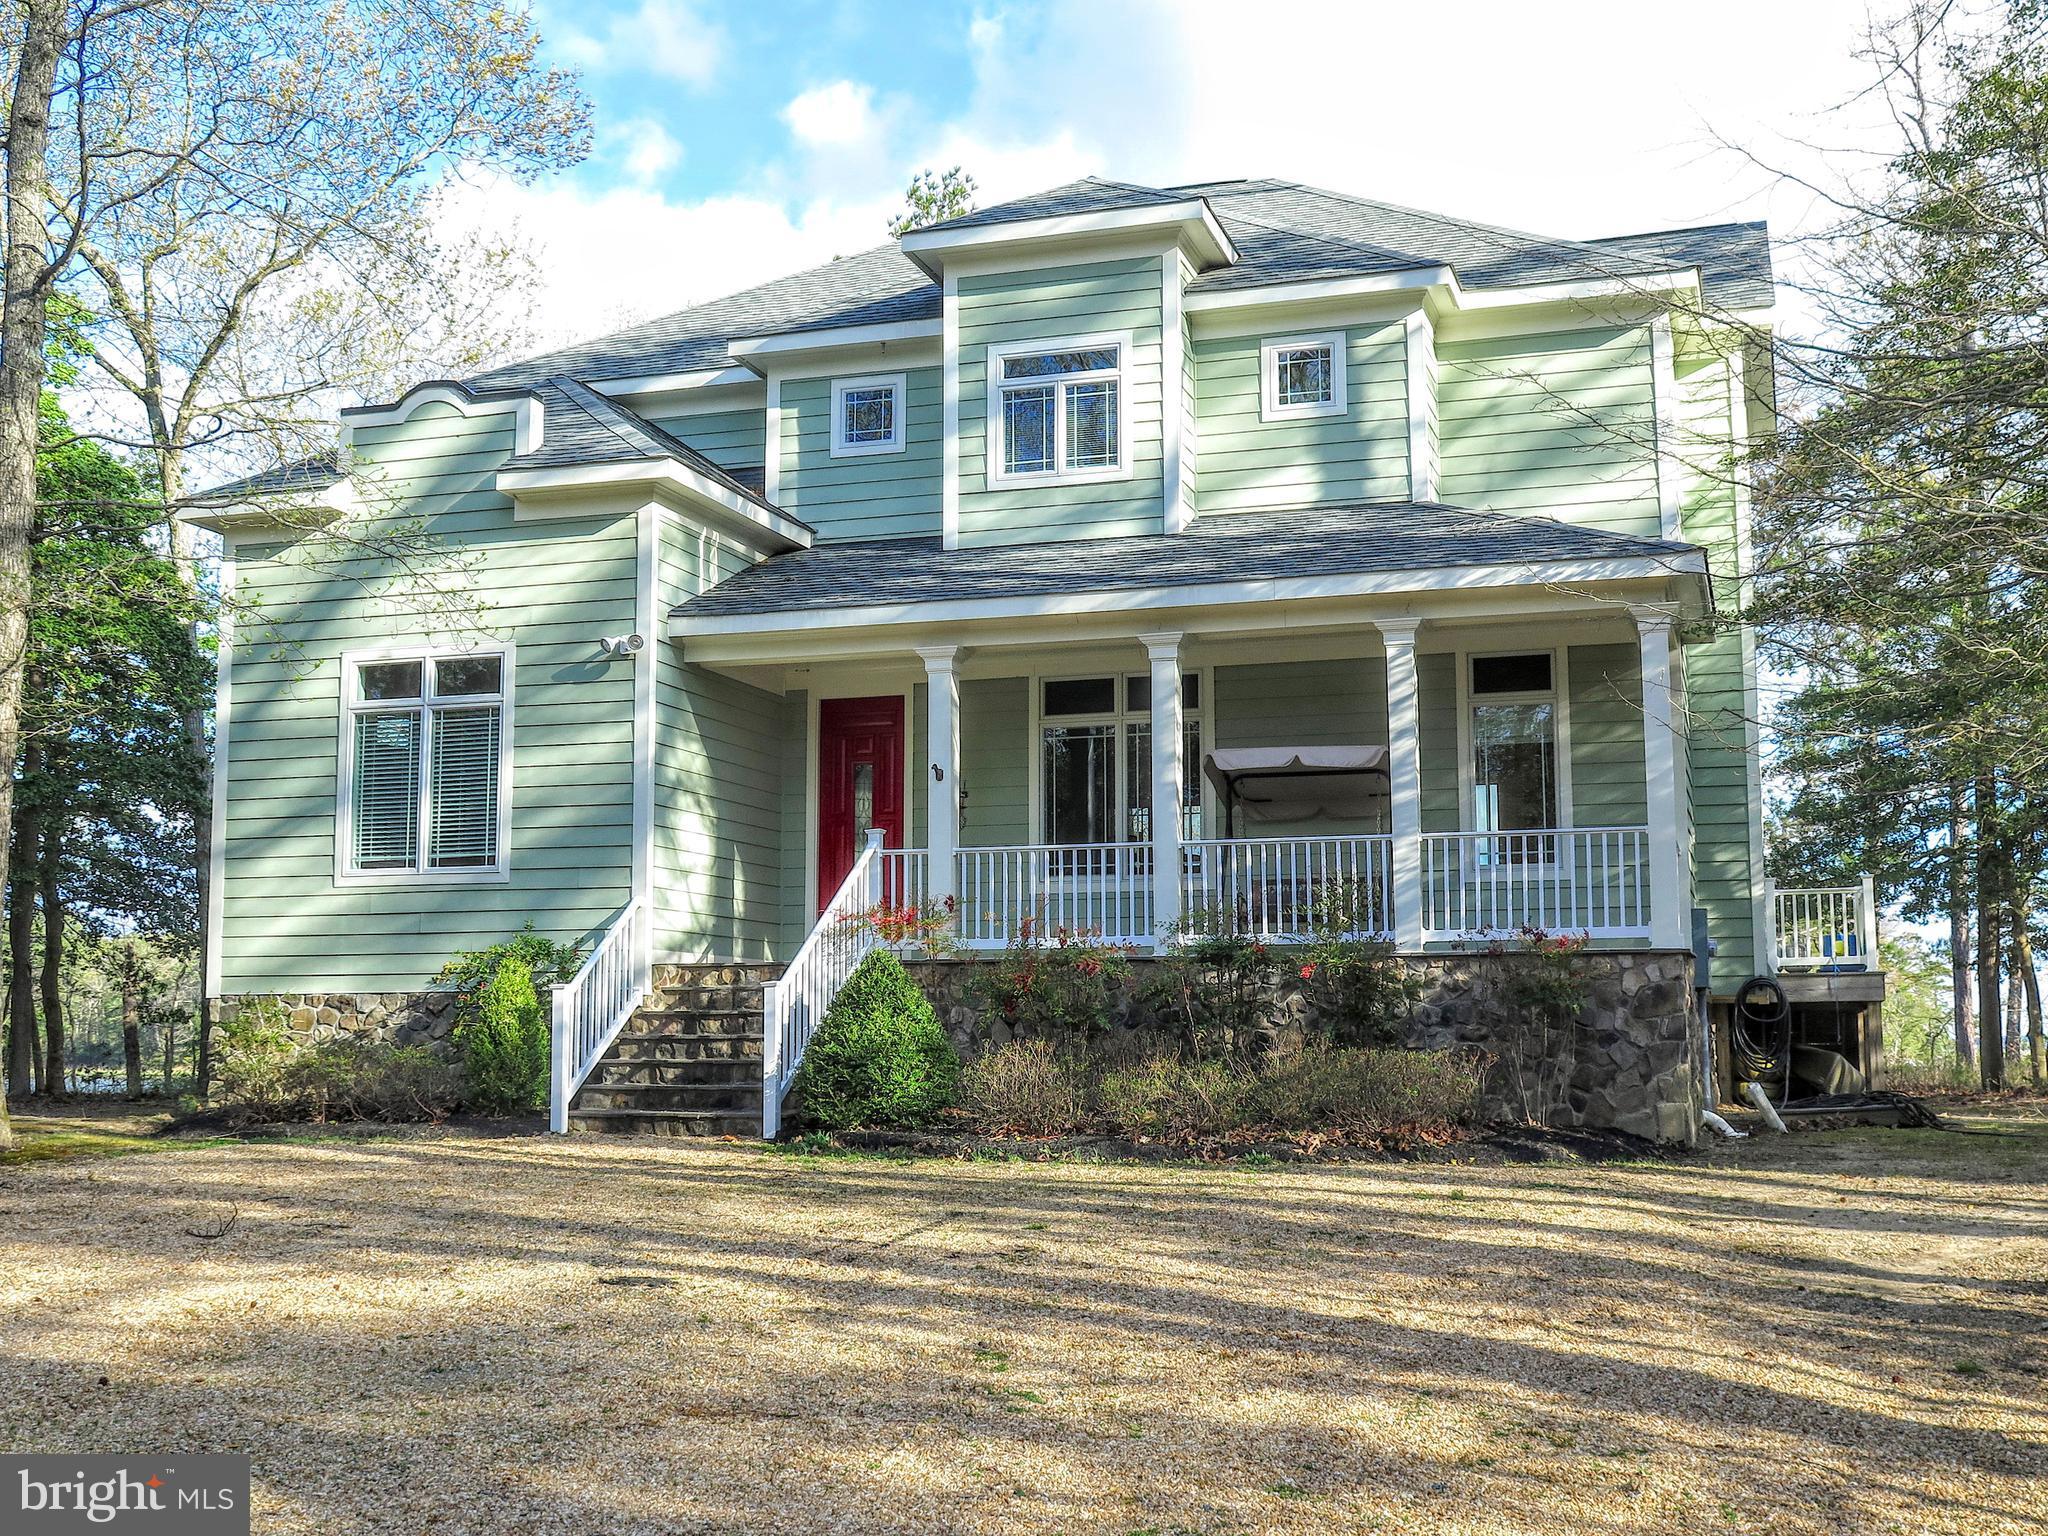 865 BLACKBEARD POND, HAGUE, VA 22469